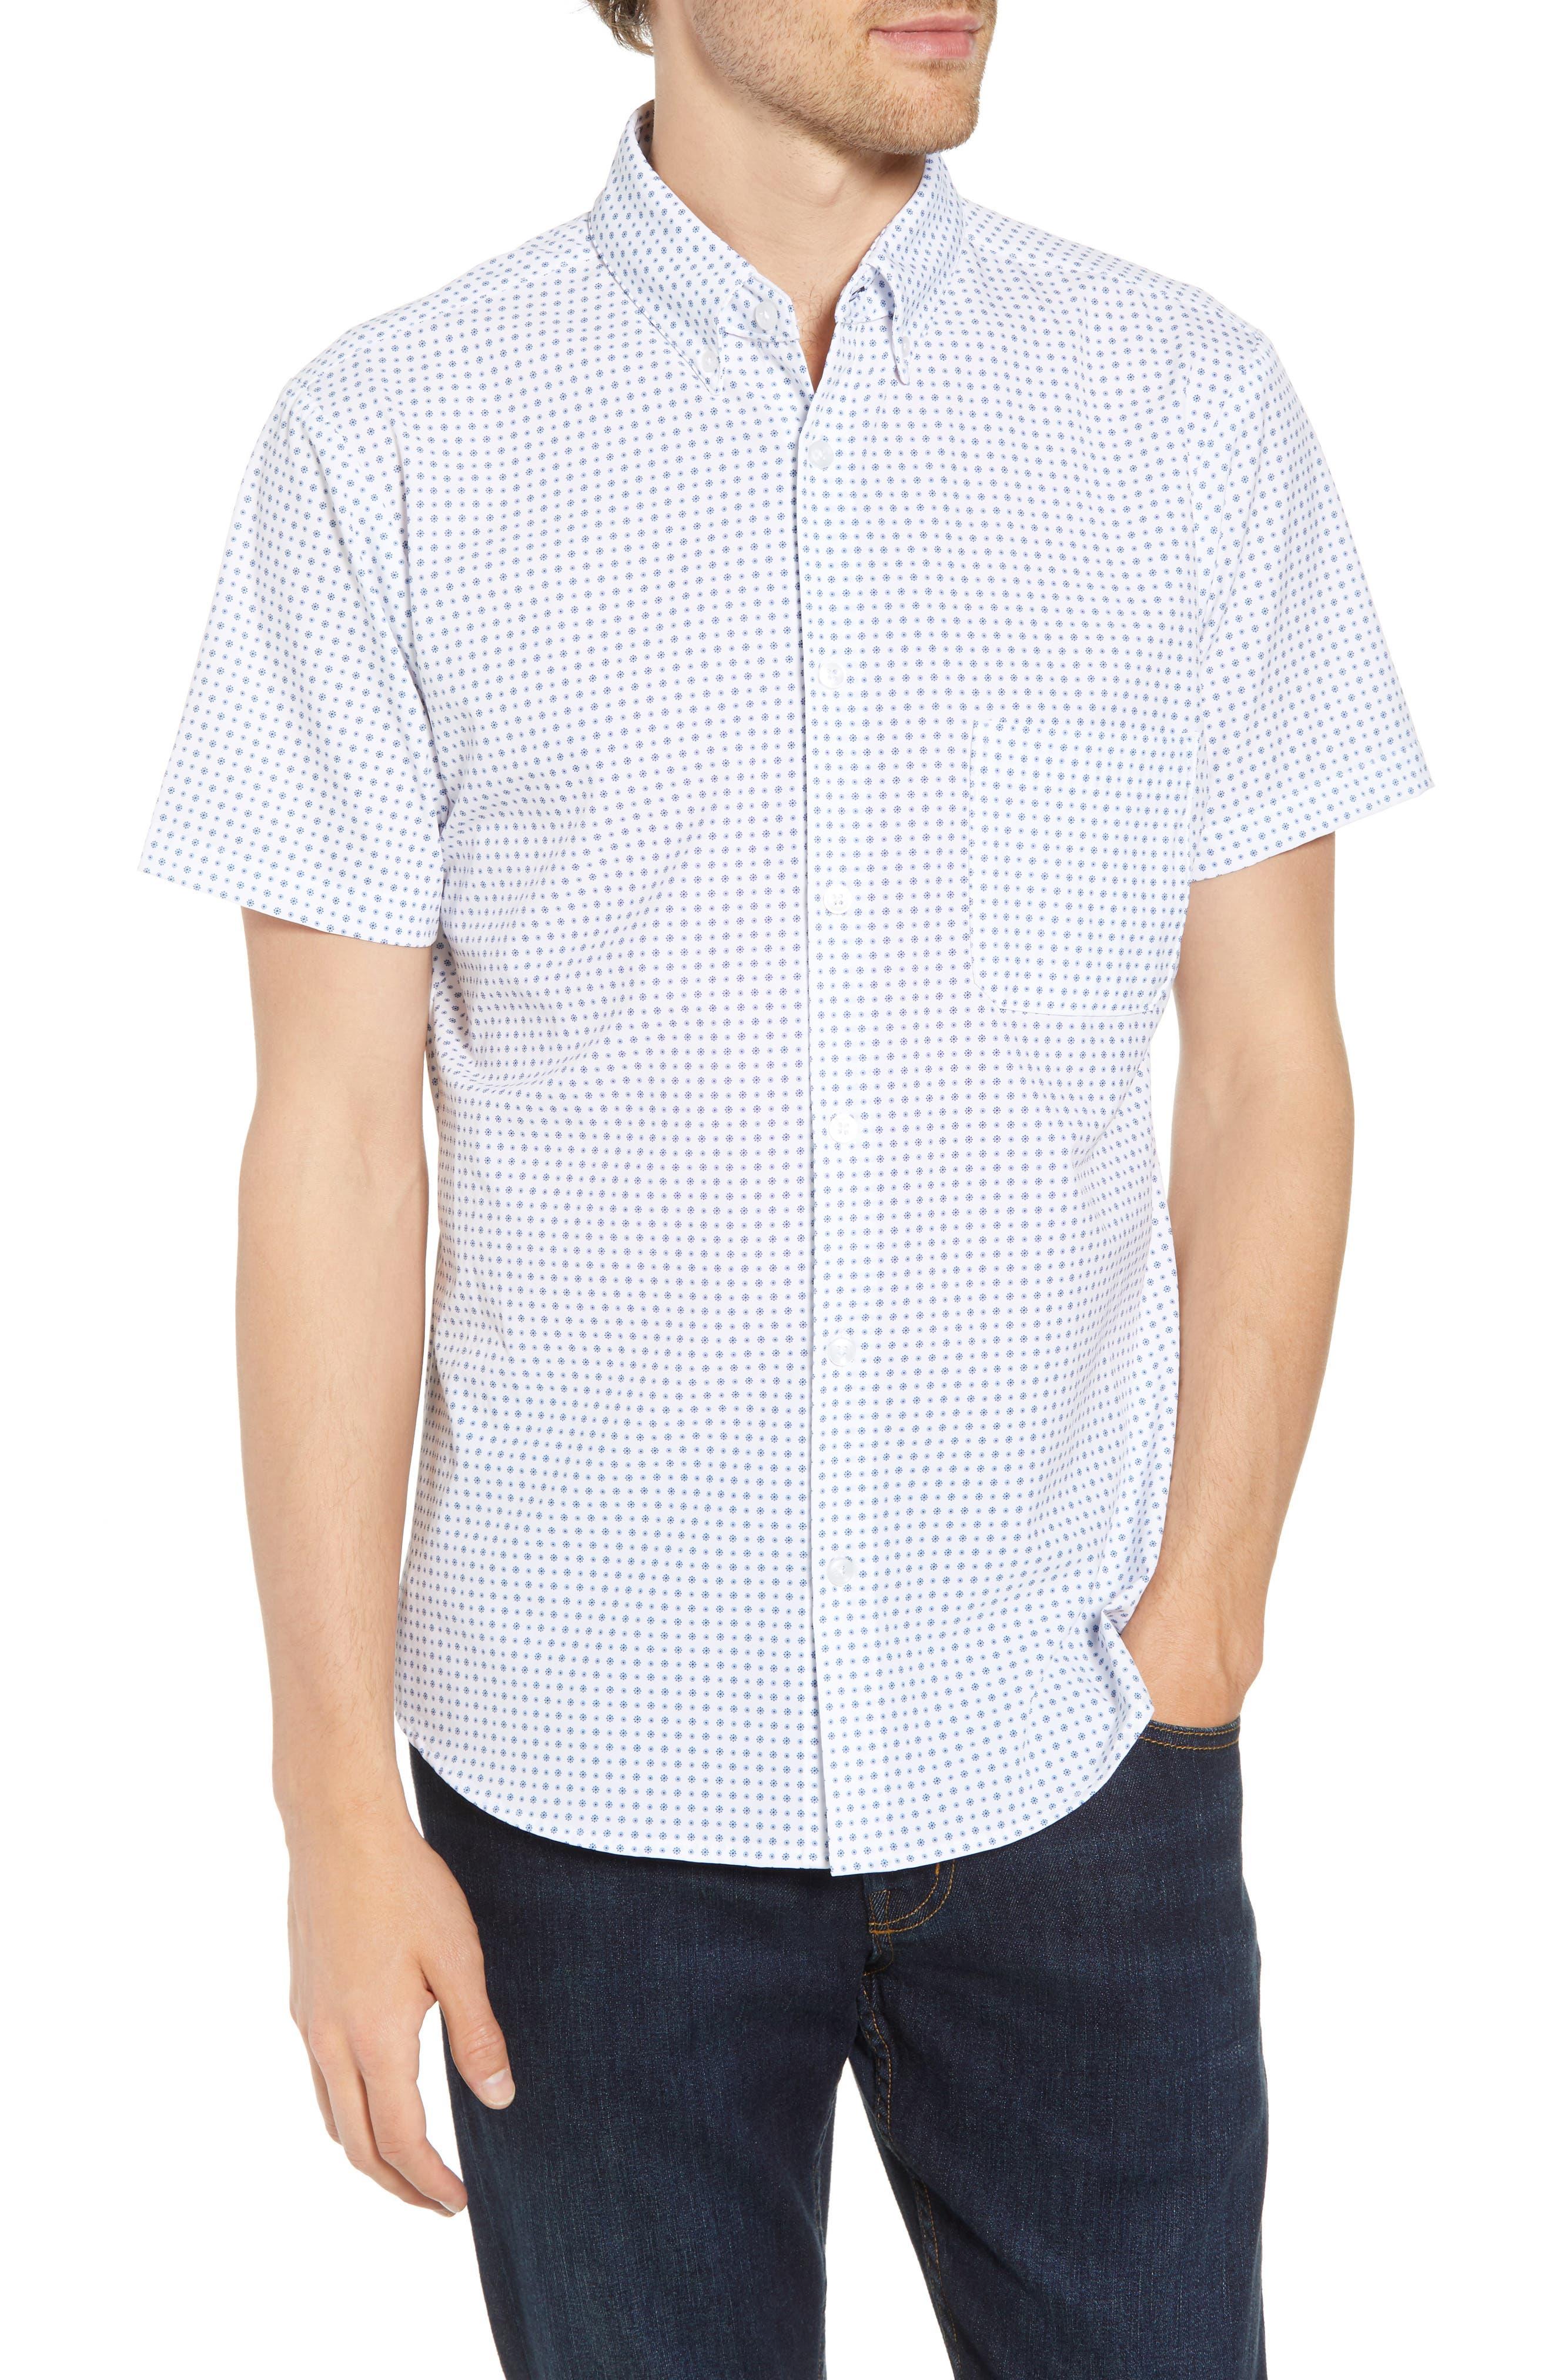 Darst Slim Fit Performance Sport Shirt,                         Main,                         color, 117